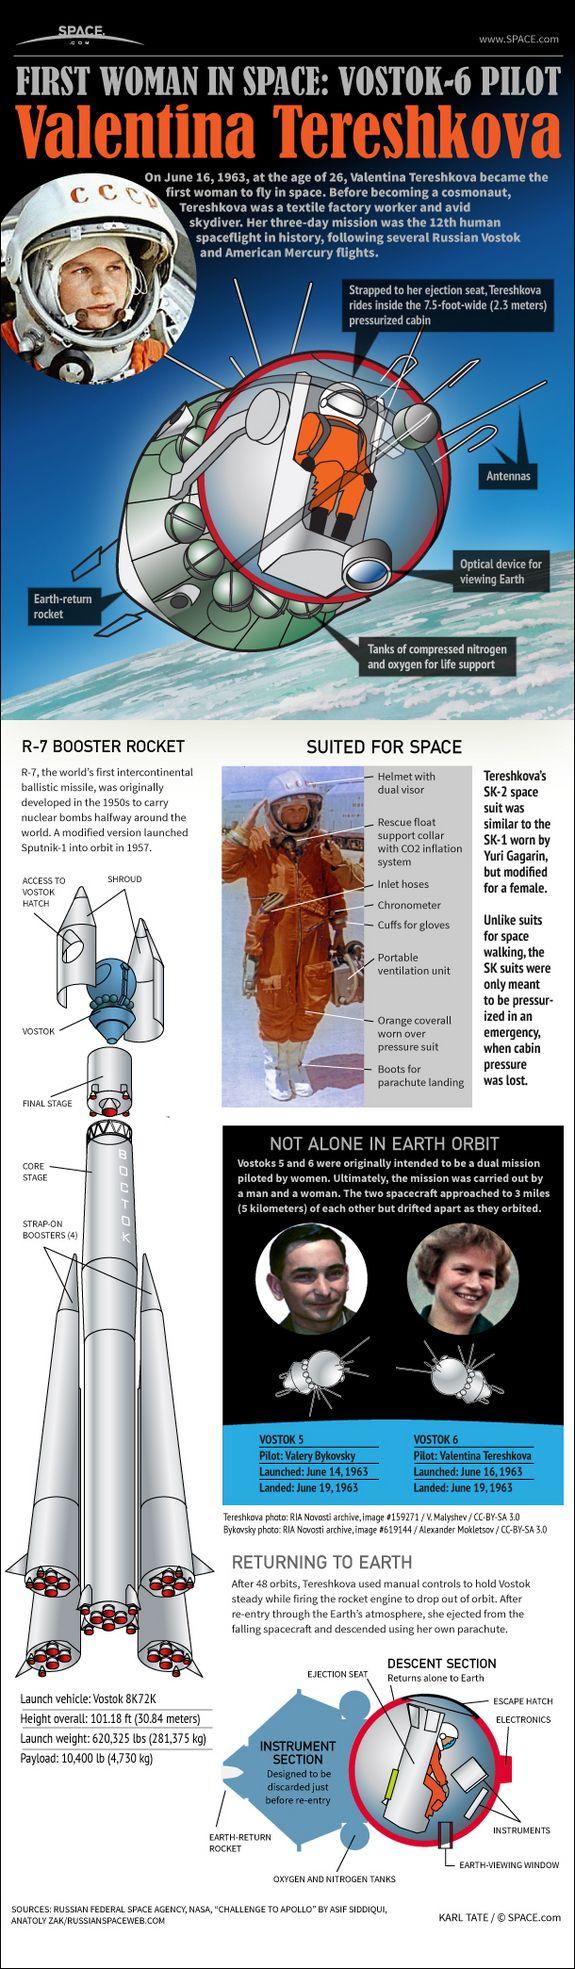 How Valentina Tereshkova's 1963 Vostok-6 Flight Worked #Infographic